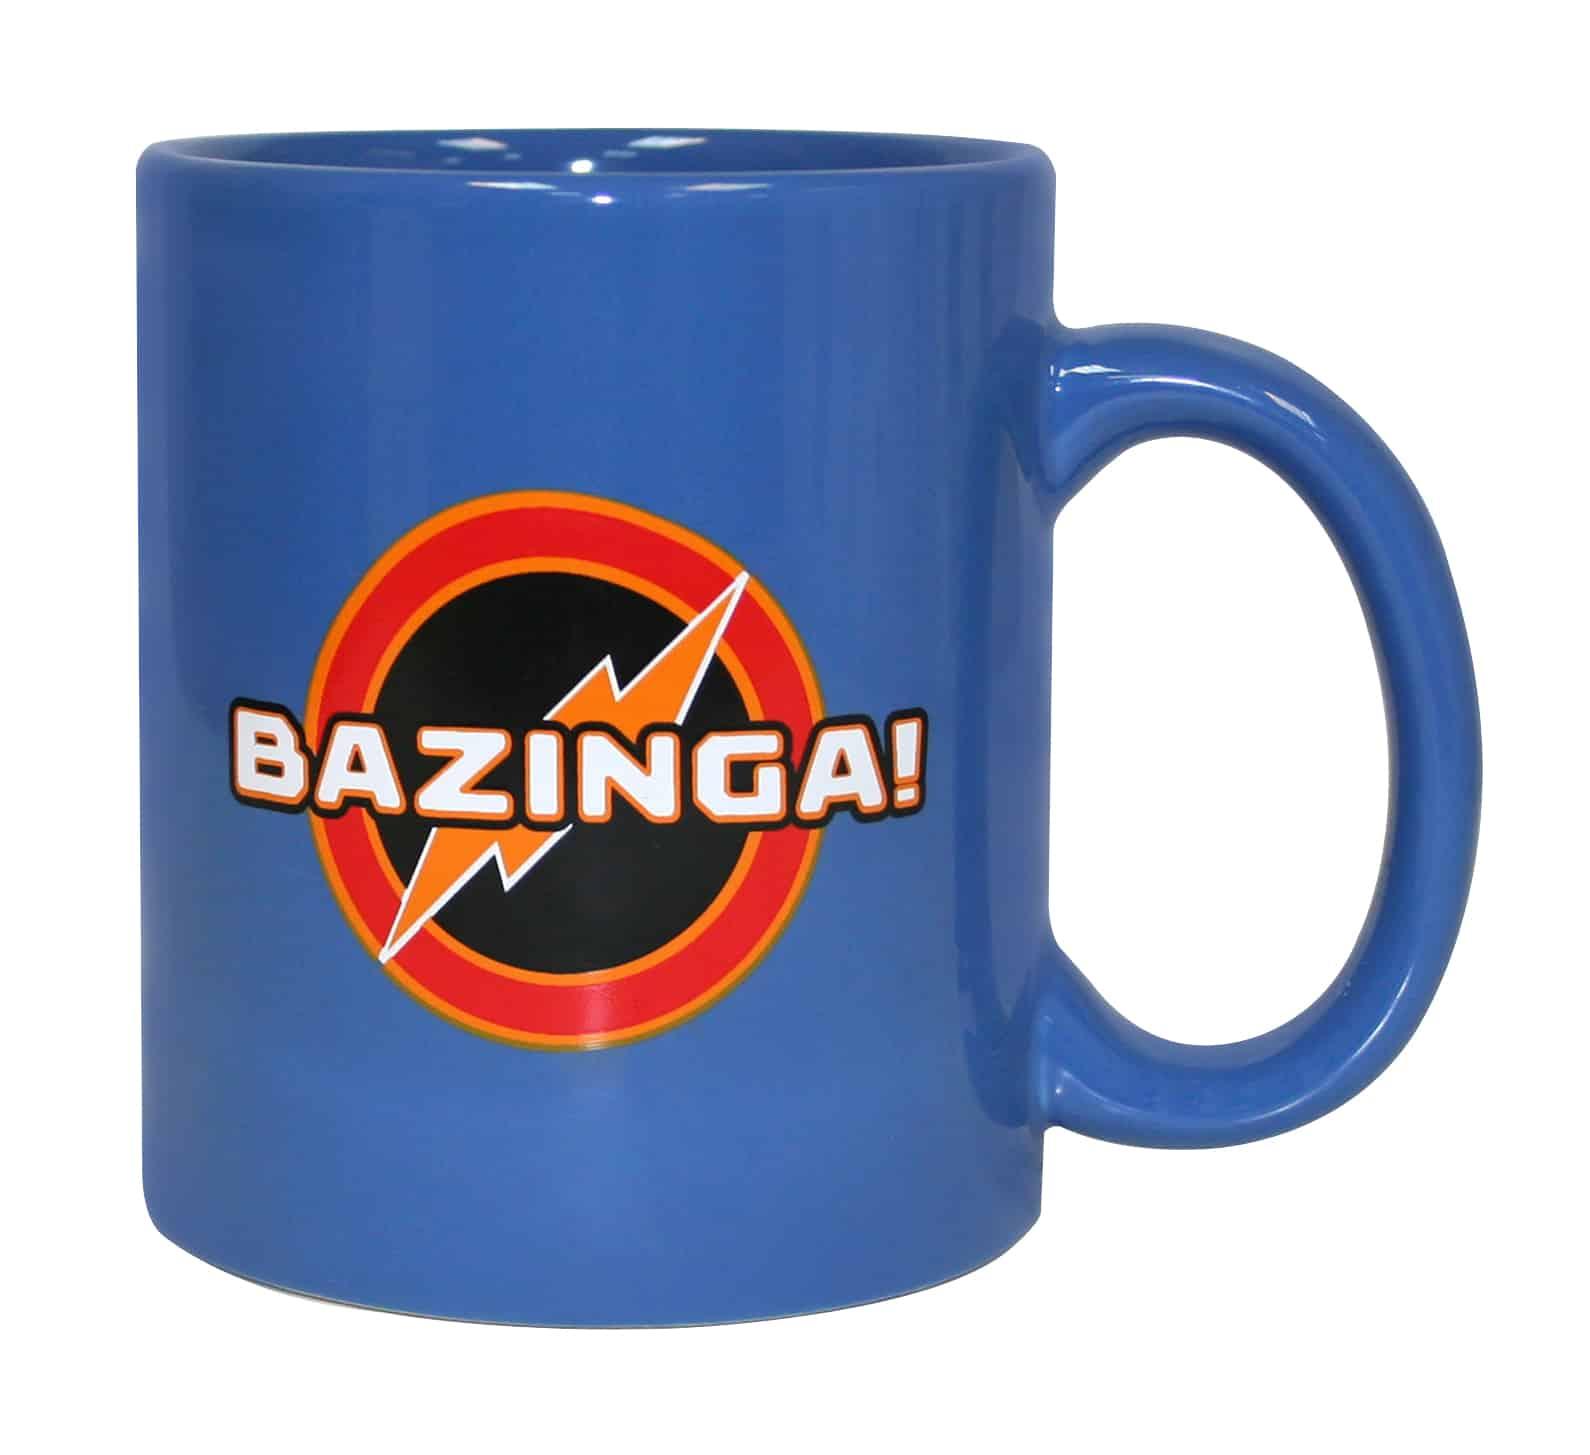 BAZINGA TAZA AZUL CERAMICA THE BIG BANG THEORY